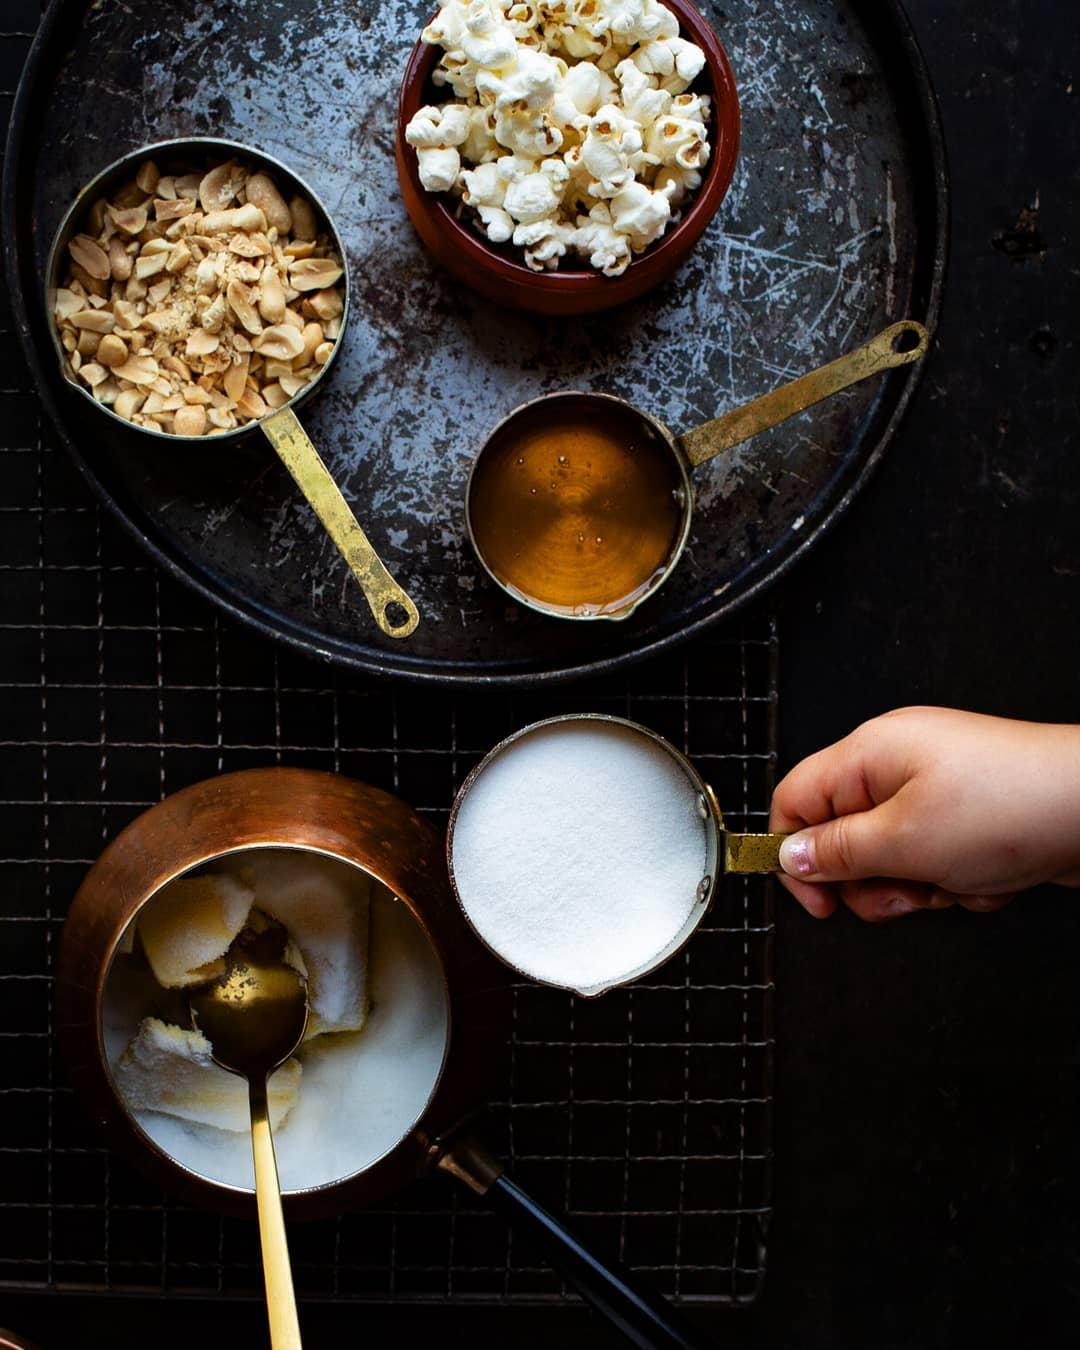 preparing ingredients for candied popcorn